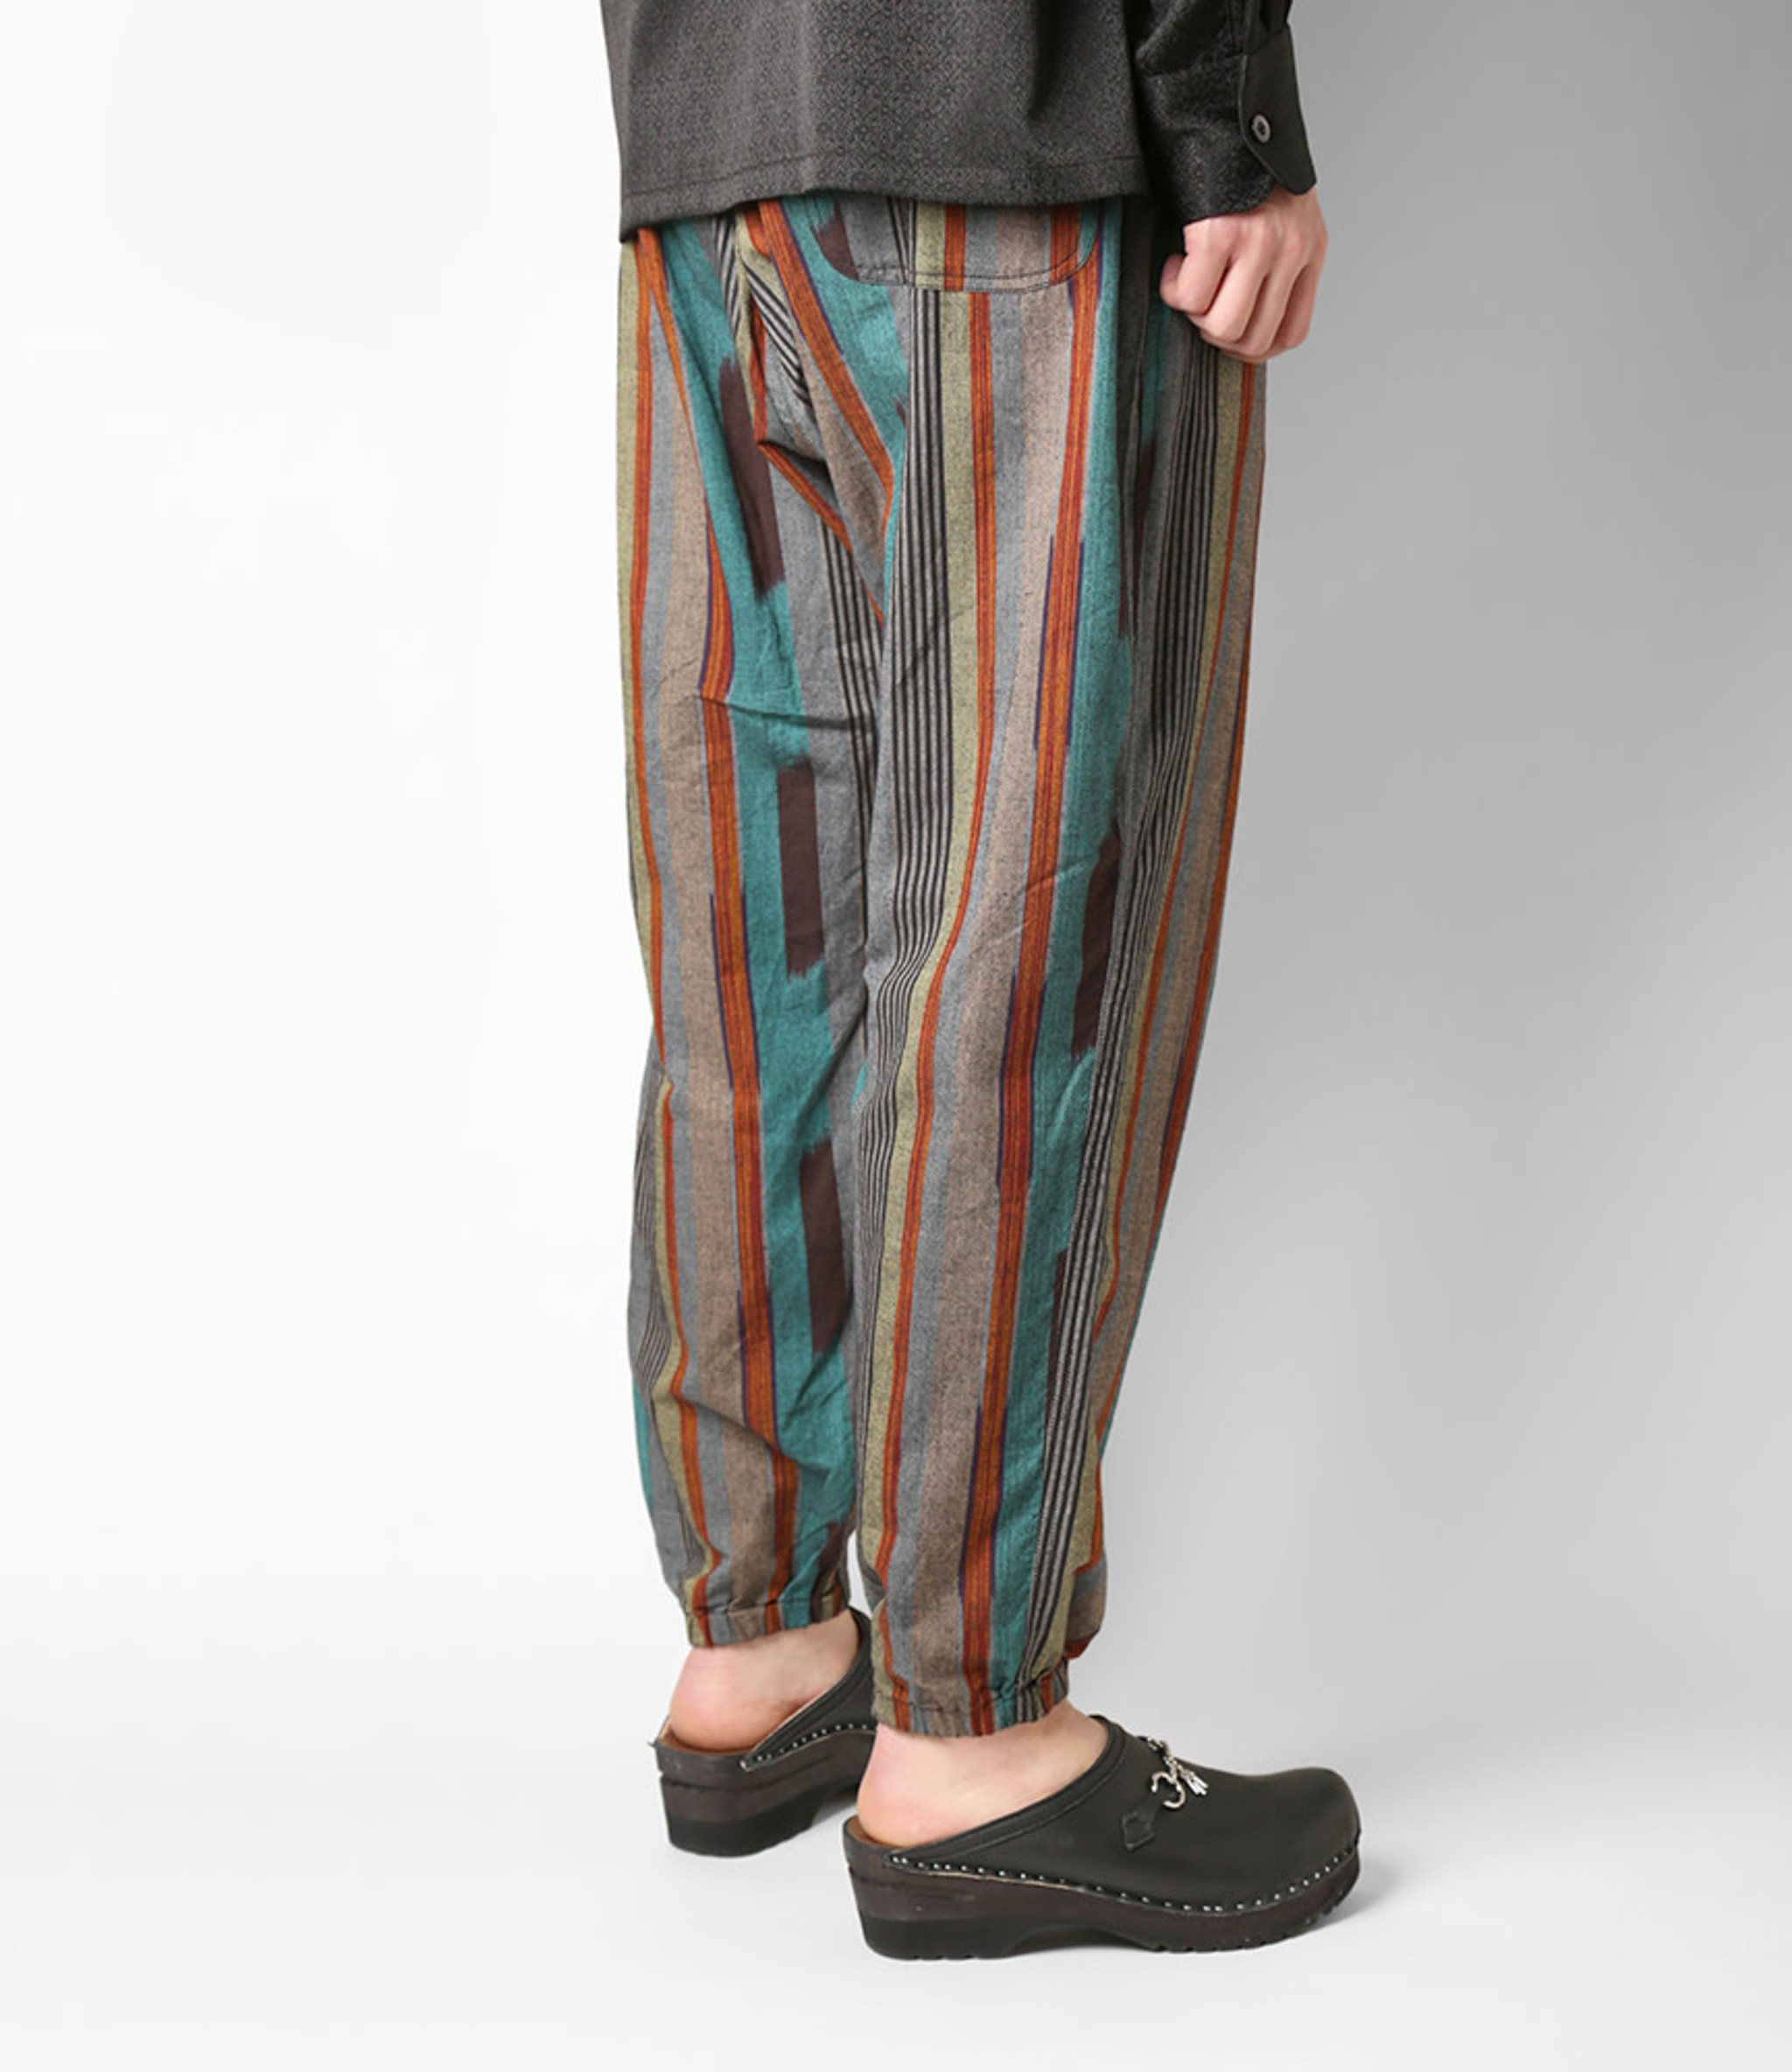 South2 West8 String Slack Pant - Cotton Cloth / Splashed Pattern